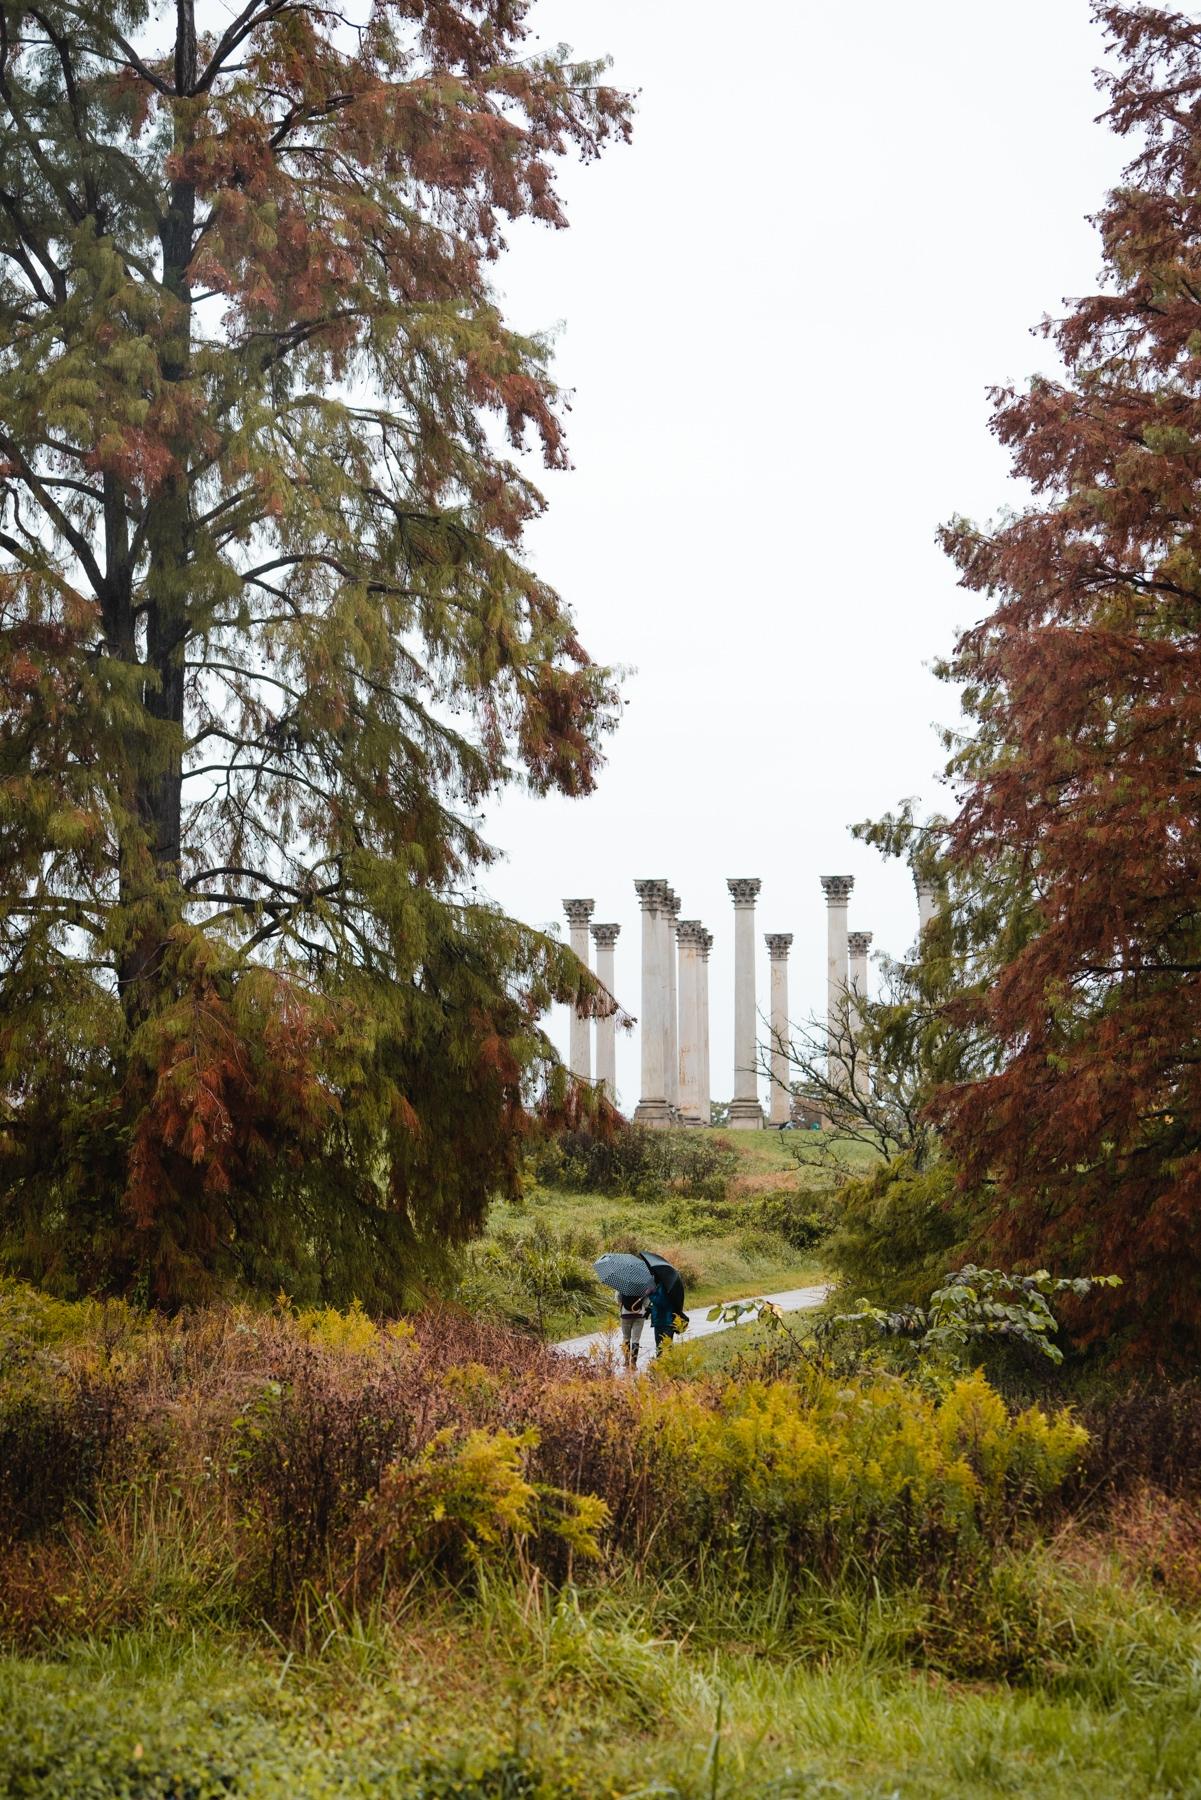 us arboretum, national arboretum, photo club, photowalk, rain, northeast washington dc, United States Department of Agriculture's Agricultural Research Service